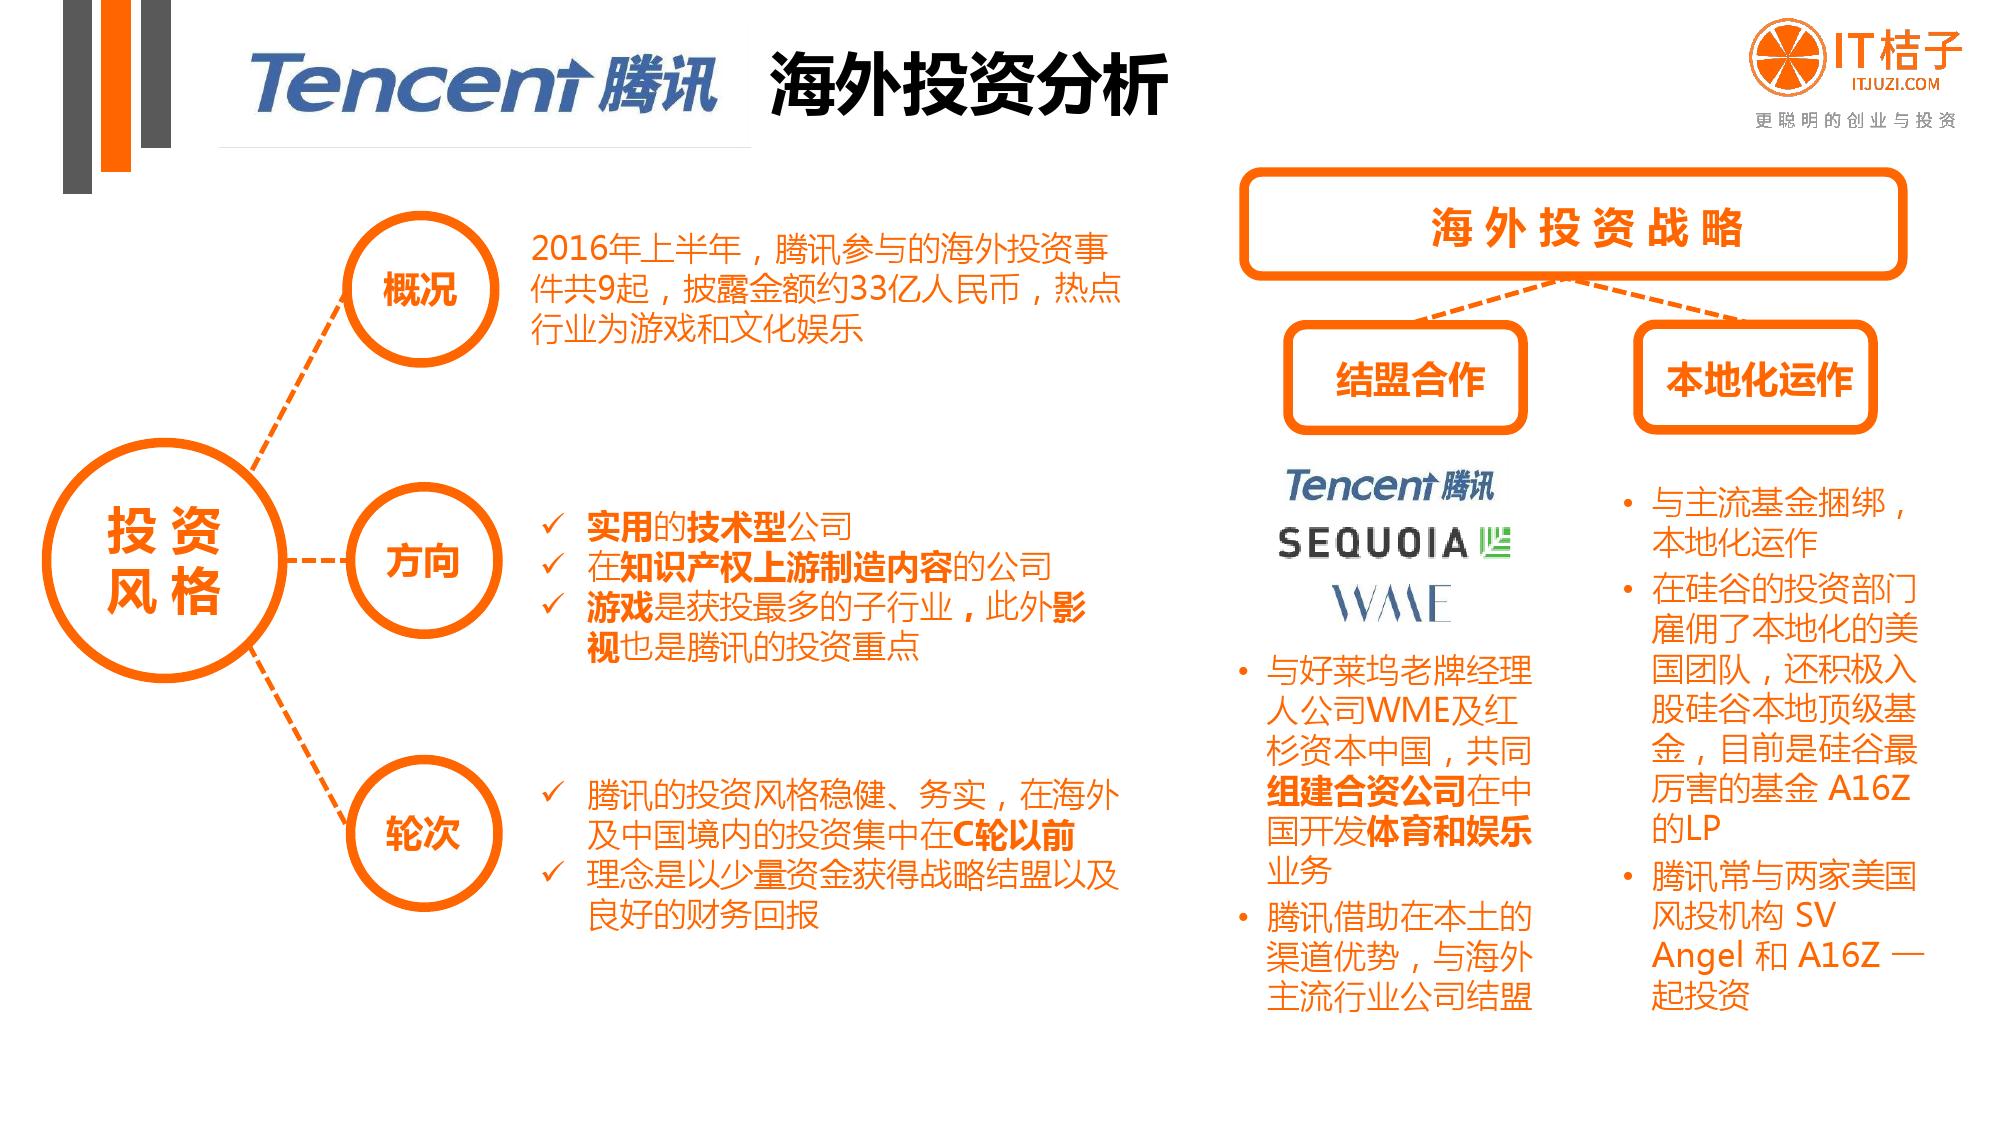 【IT桔子】2016年Q2中国互联网创业投资分析报告_000050